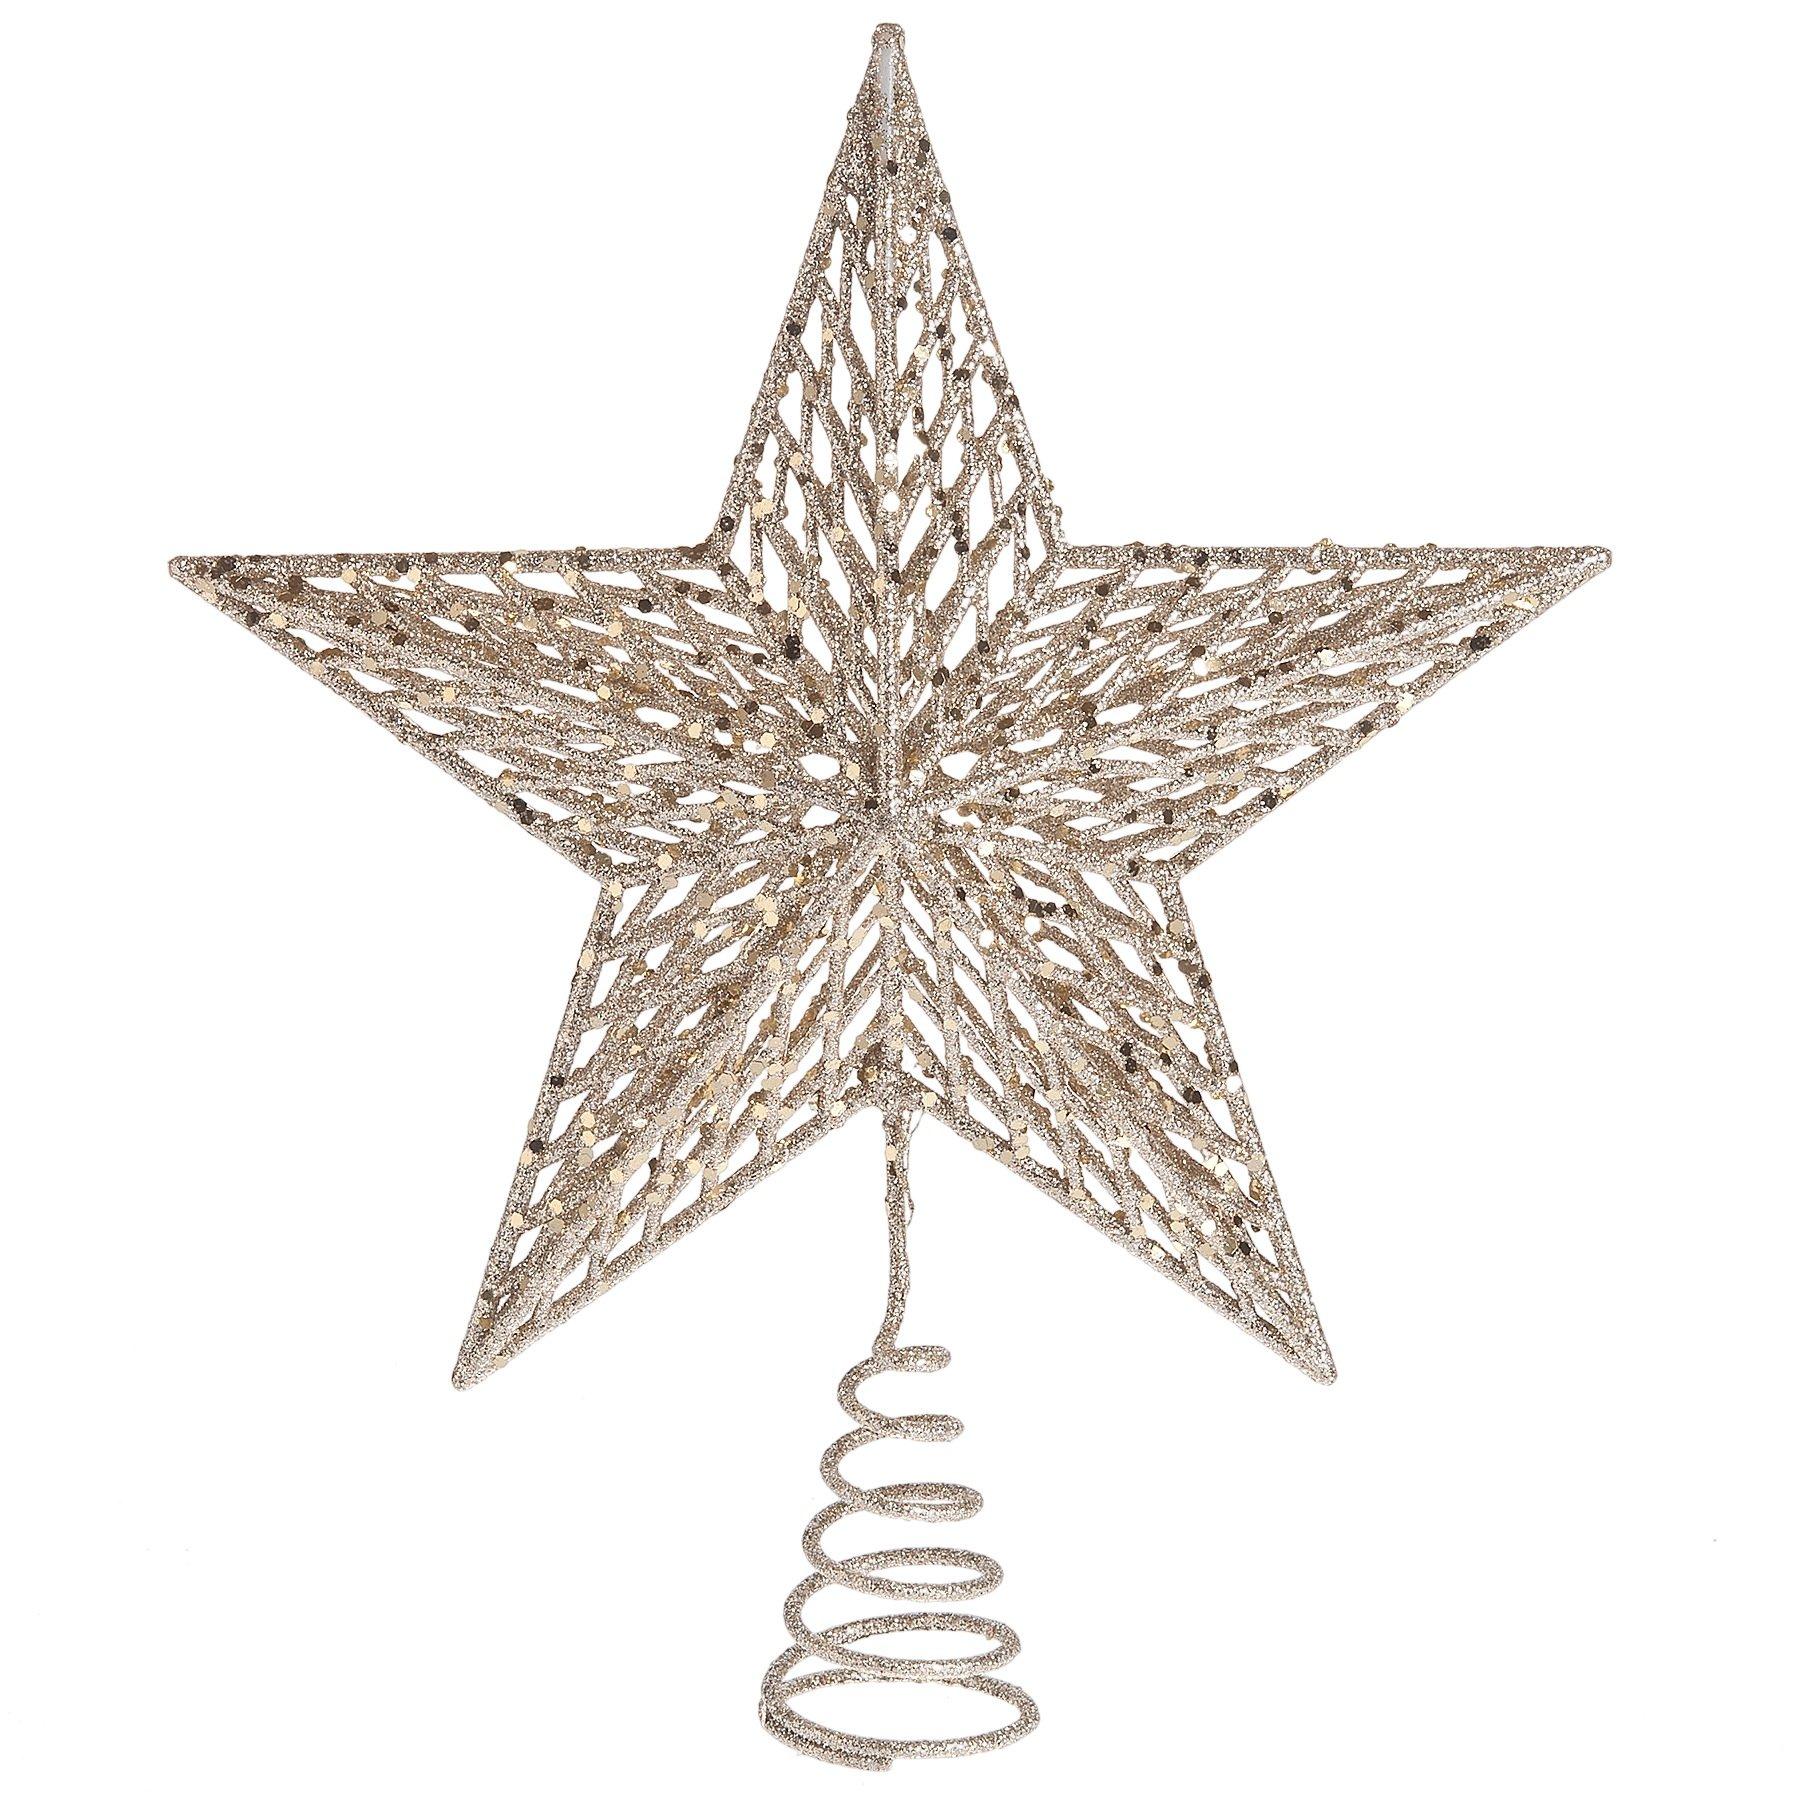 Goldtone Glitter 12 x 11 Inch Metal Spring Base Star Christmas Tree Topper